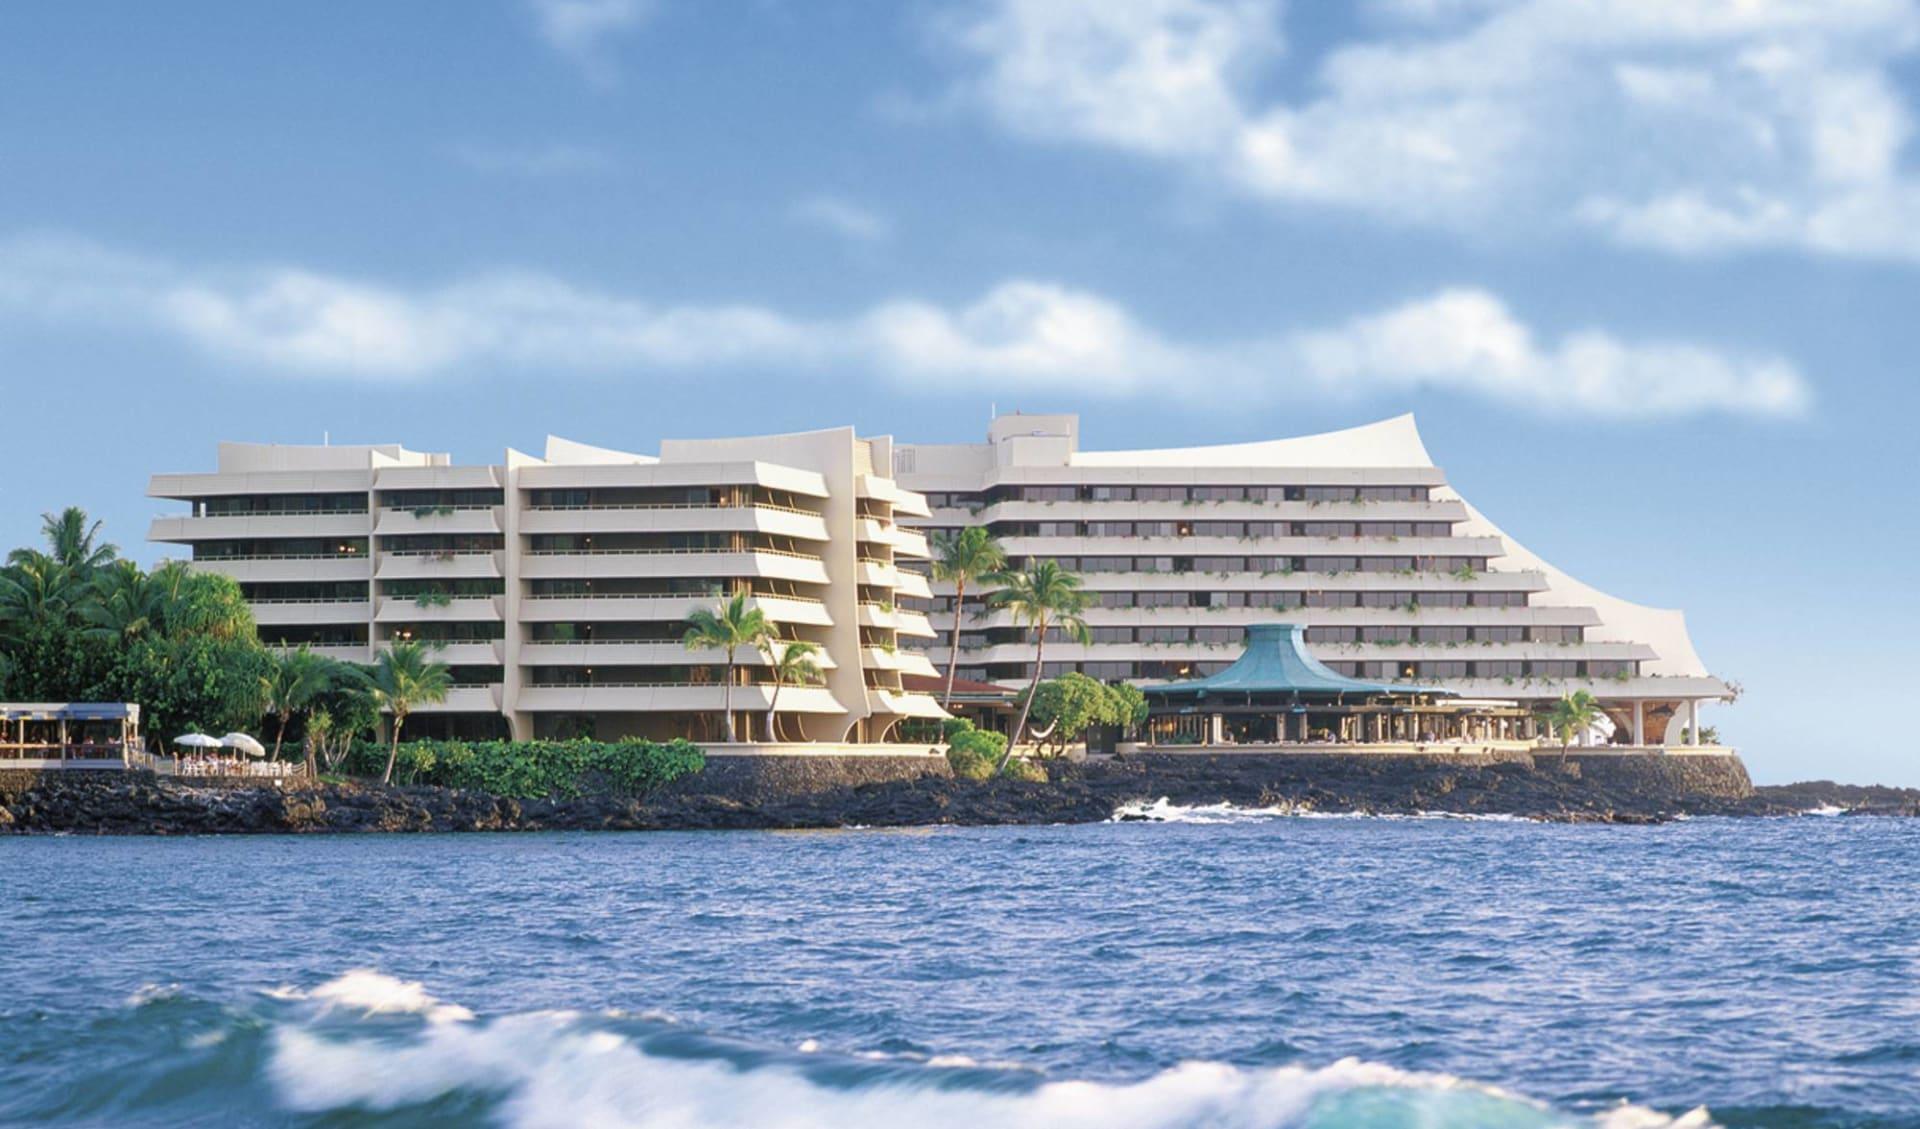 Royal Kona Resort in Kailua-Kona: exterior royal kona resort meer hotelgebäude